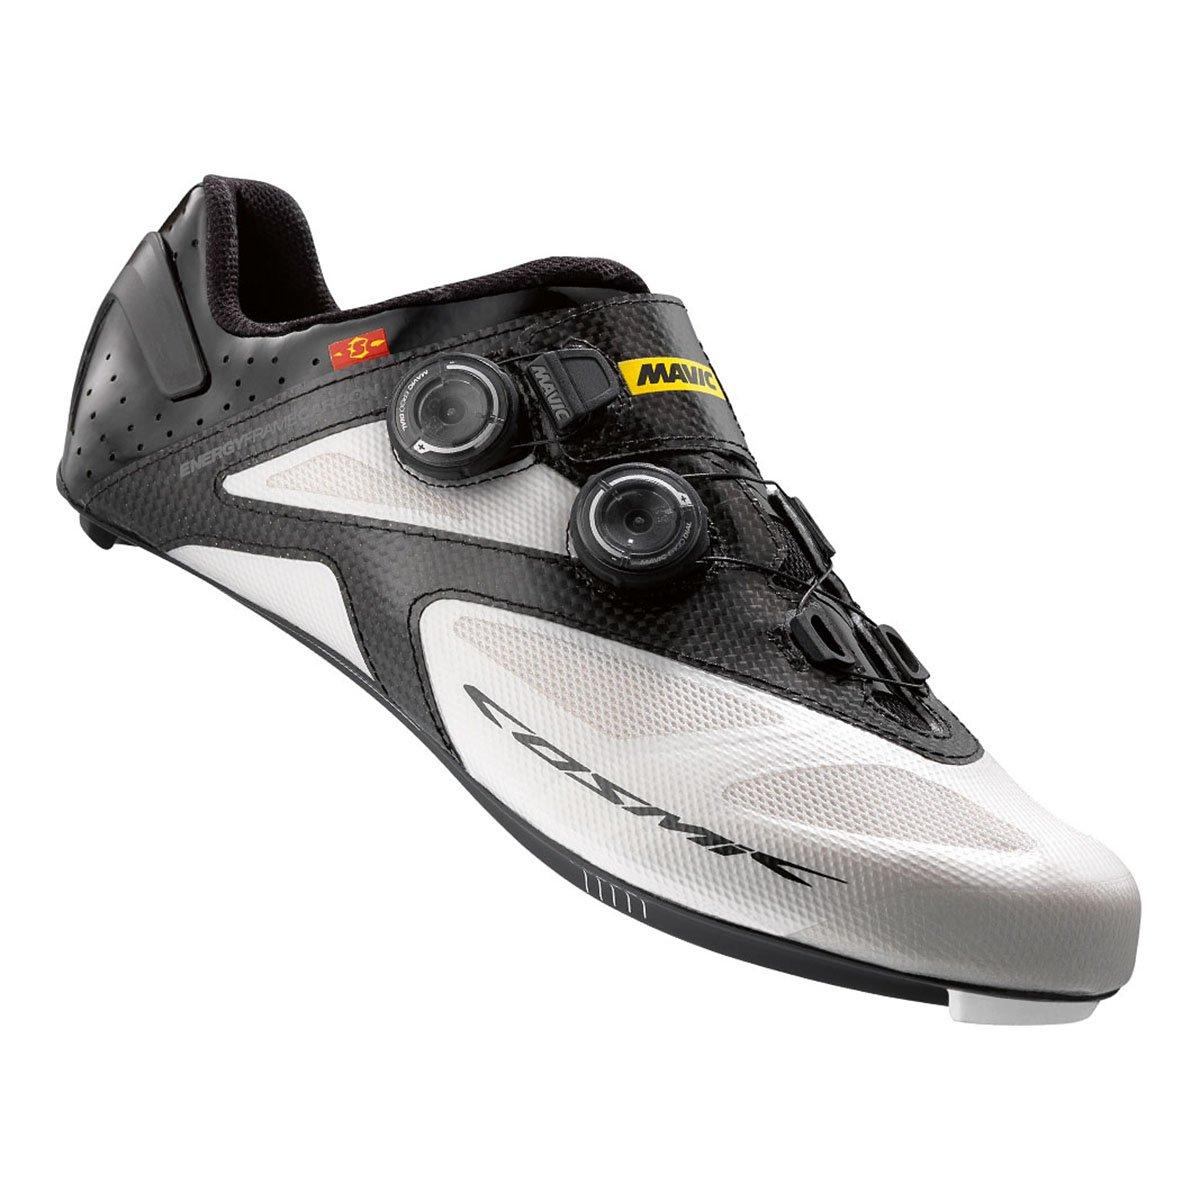 Mavic Men's Cosmic Ultimate II Road Bike Cycling Shoes B0153R8Z9W US 7.0/UK 6.5